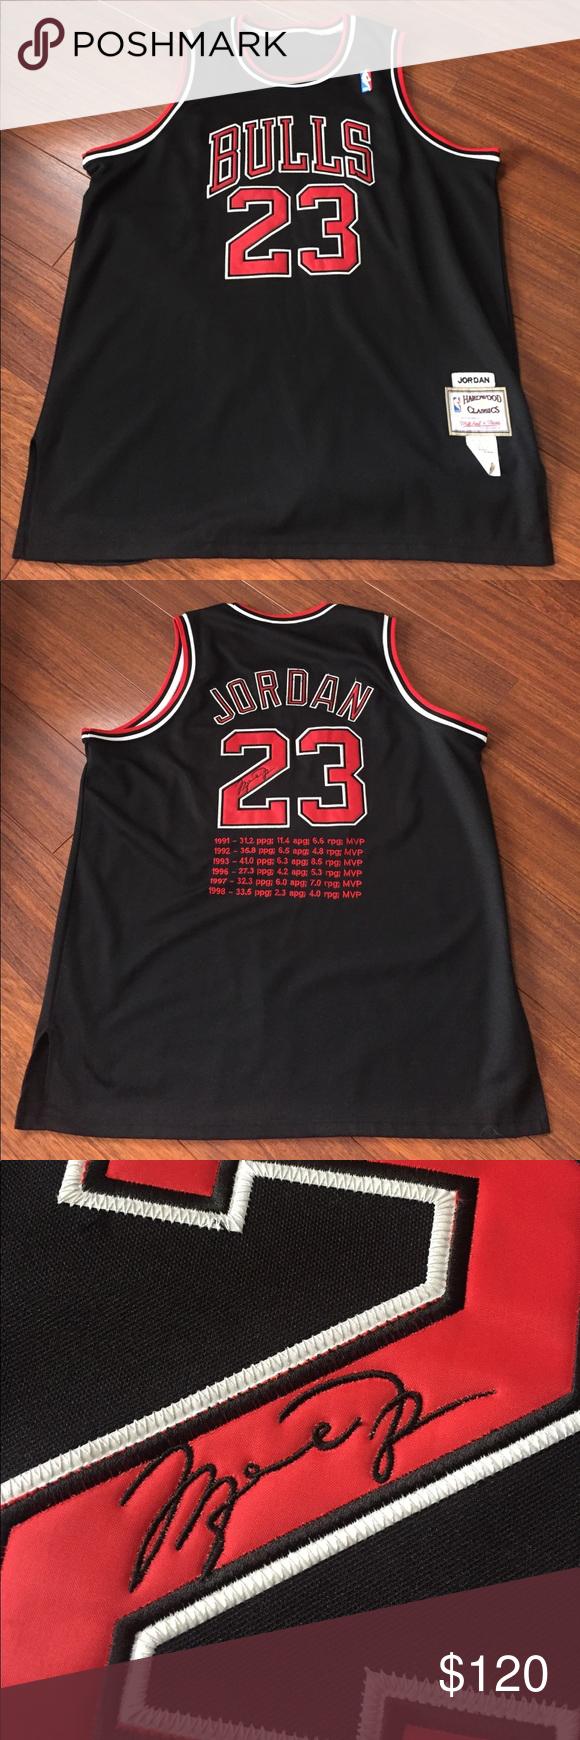 Michael Jordan Hardwood Classics Jersey Clothes Design Fashion Fashion Design